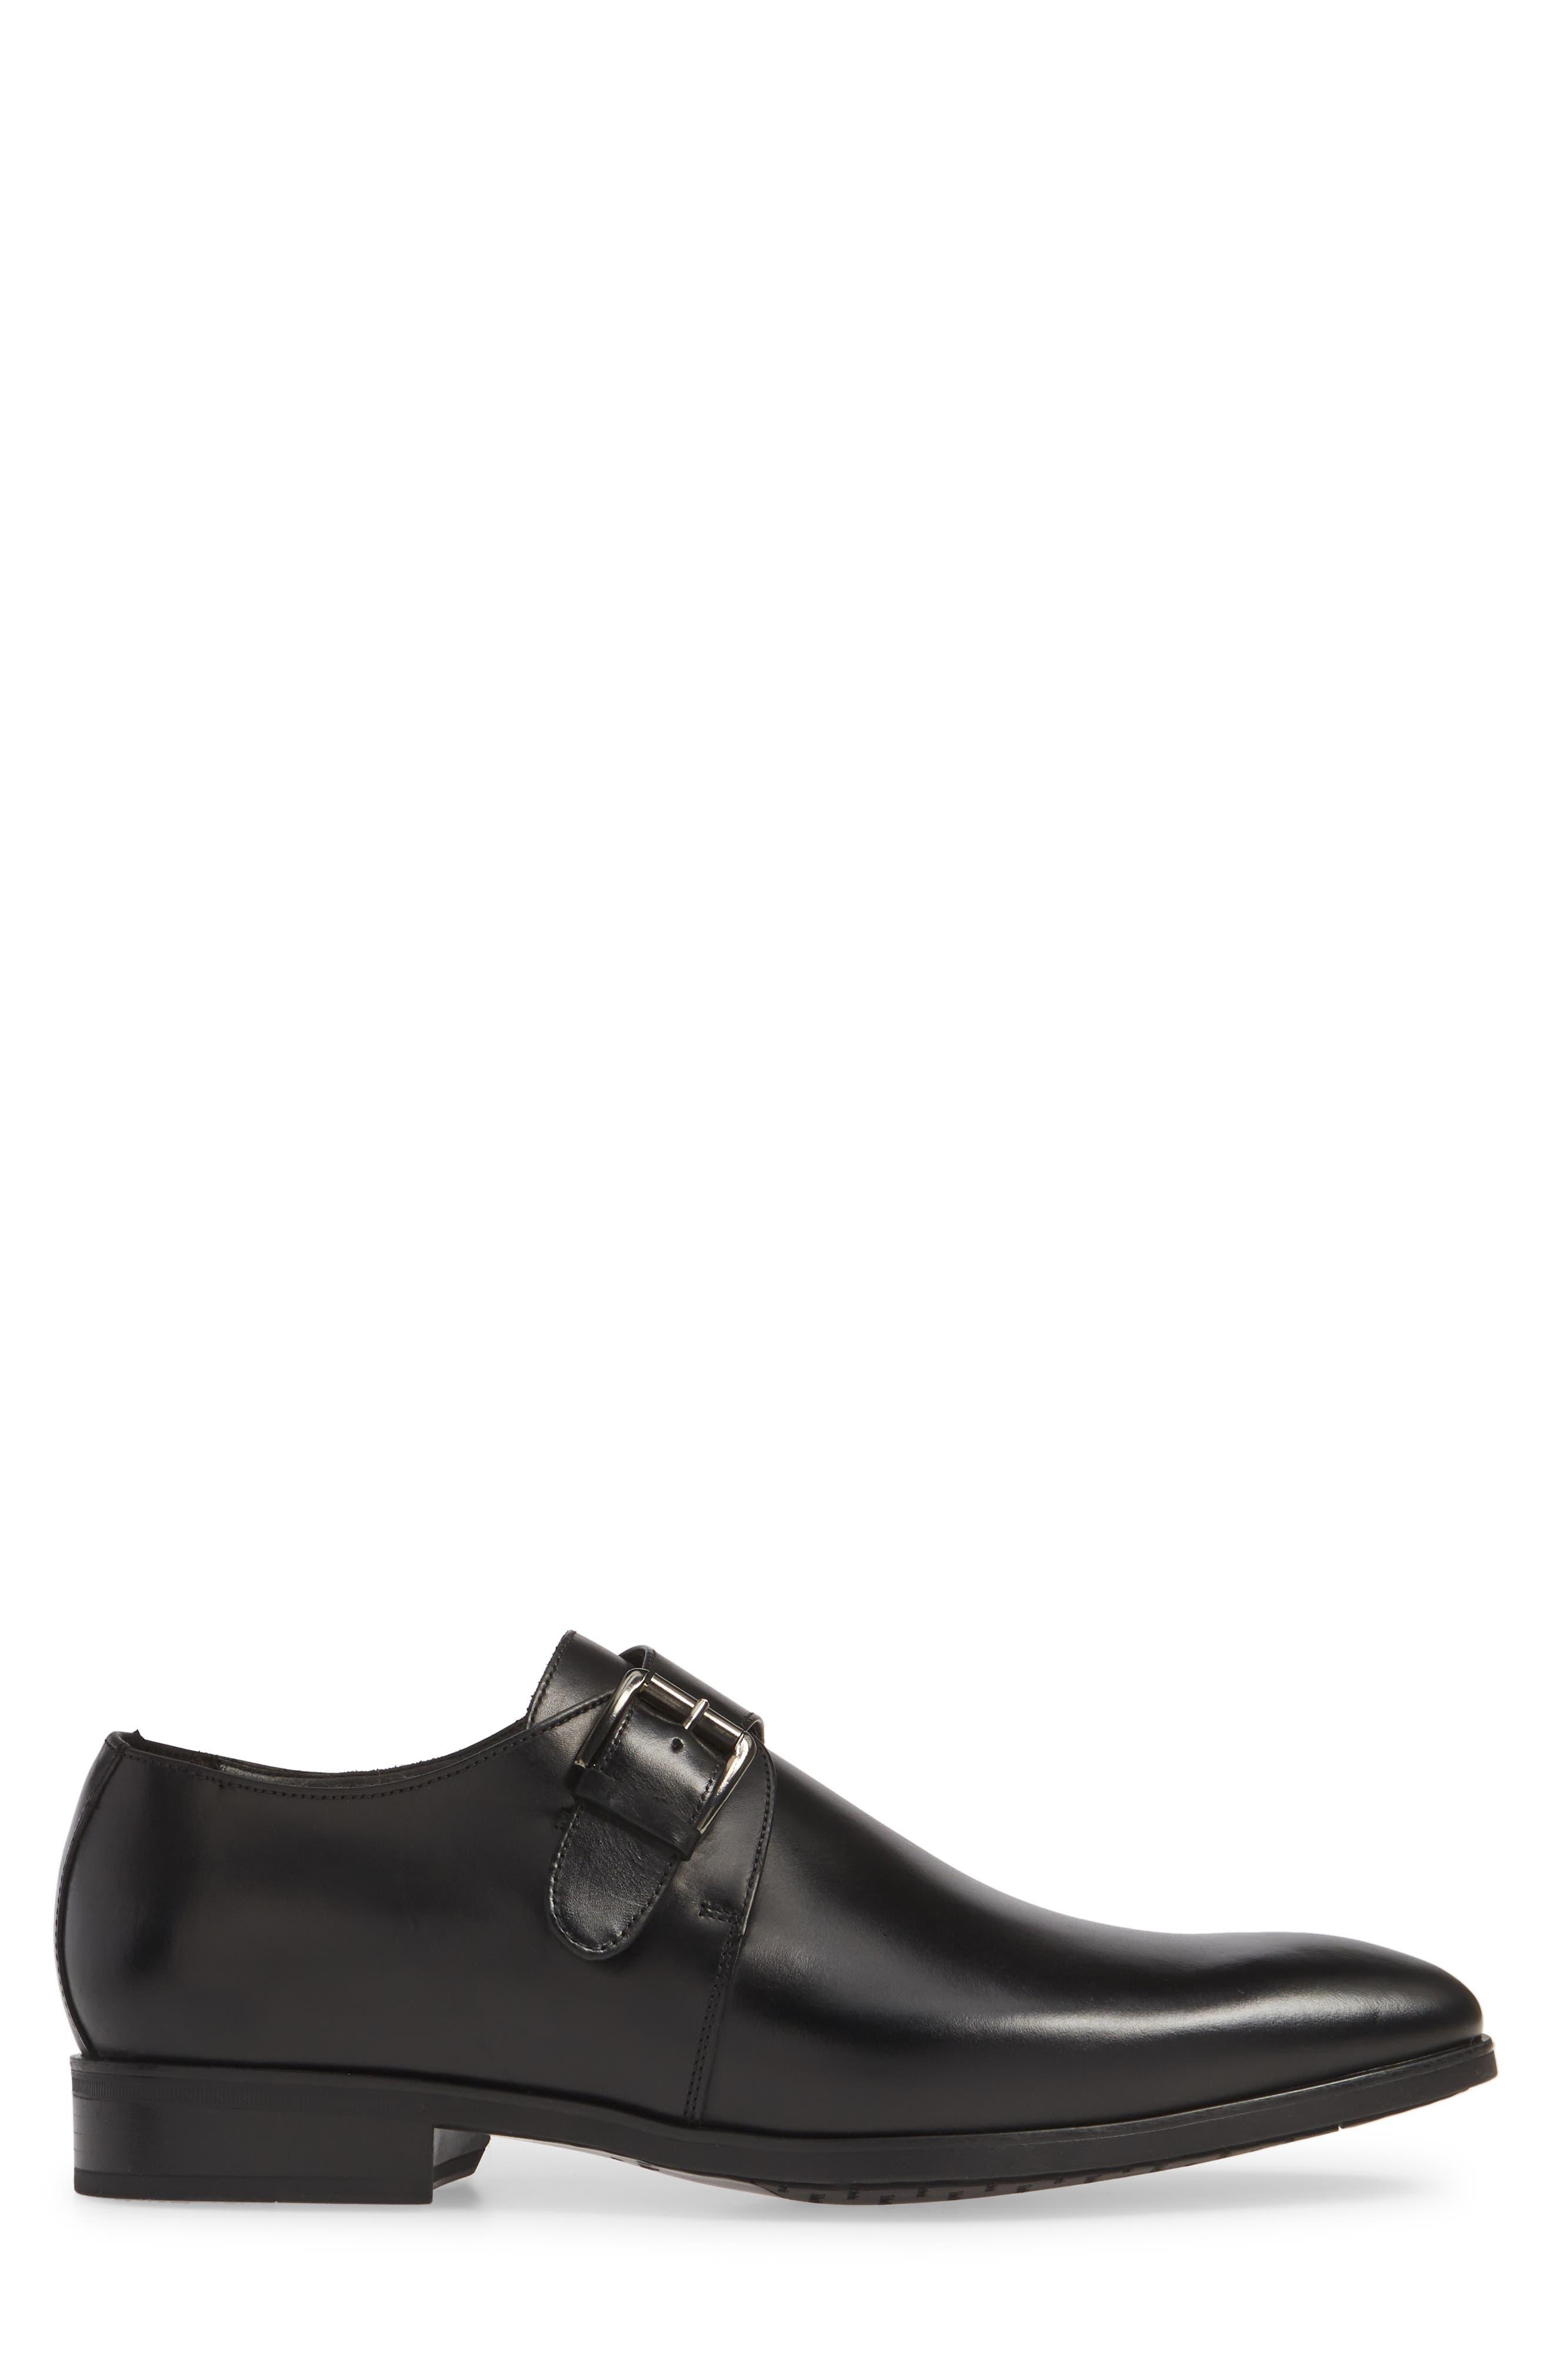 Scarpa Monk Strap Shoe,                             Alternate thumbnail 3, color,                             BLACK LEATHER